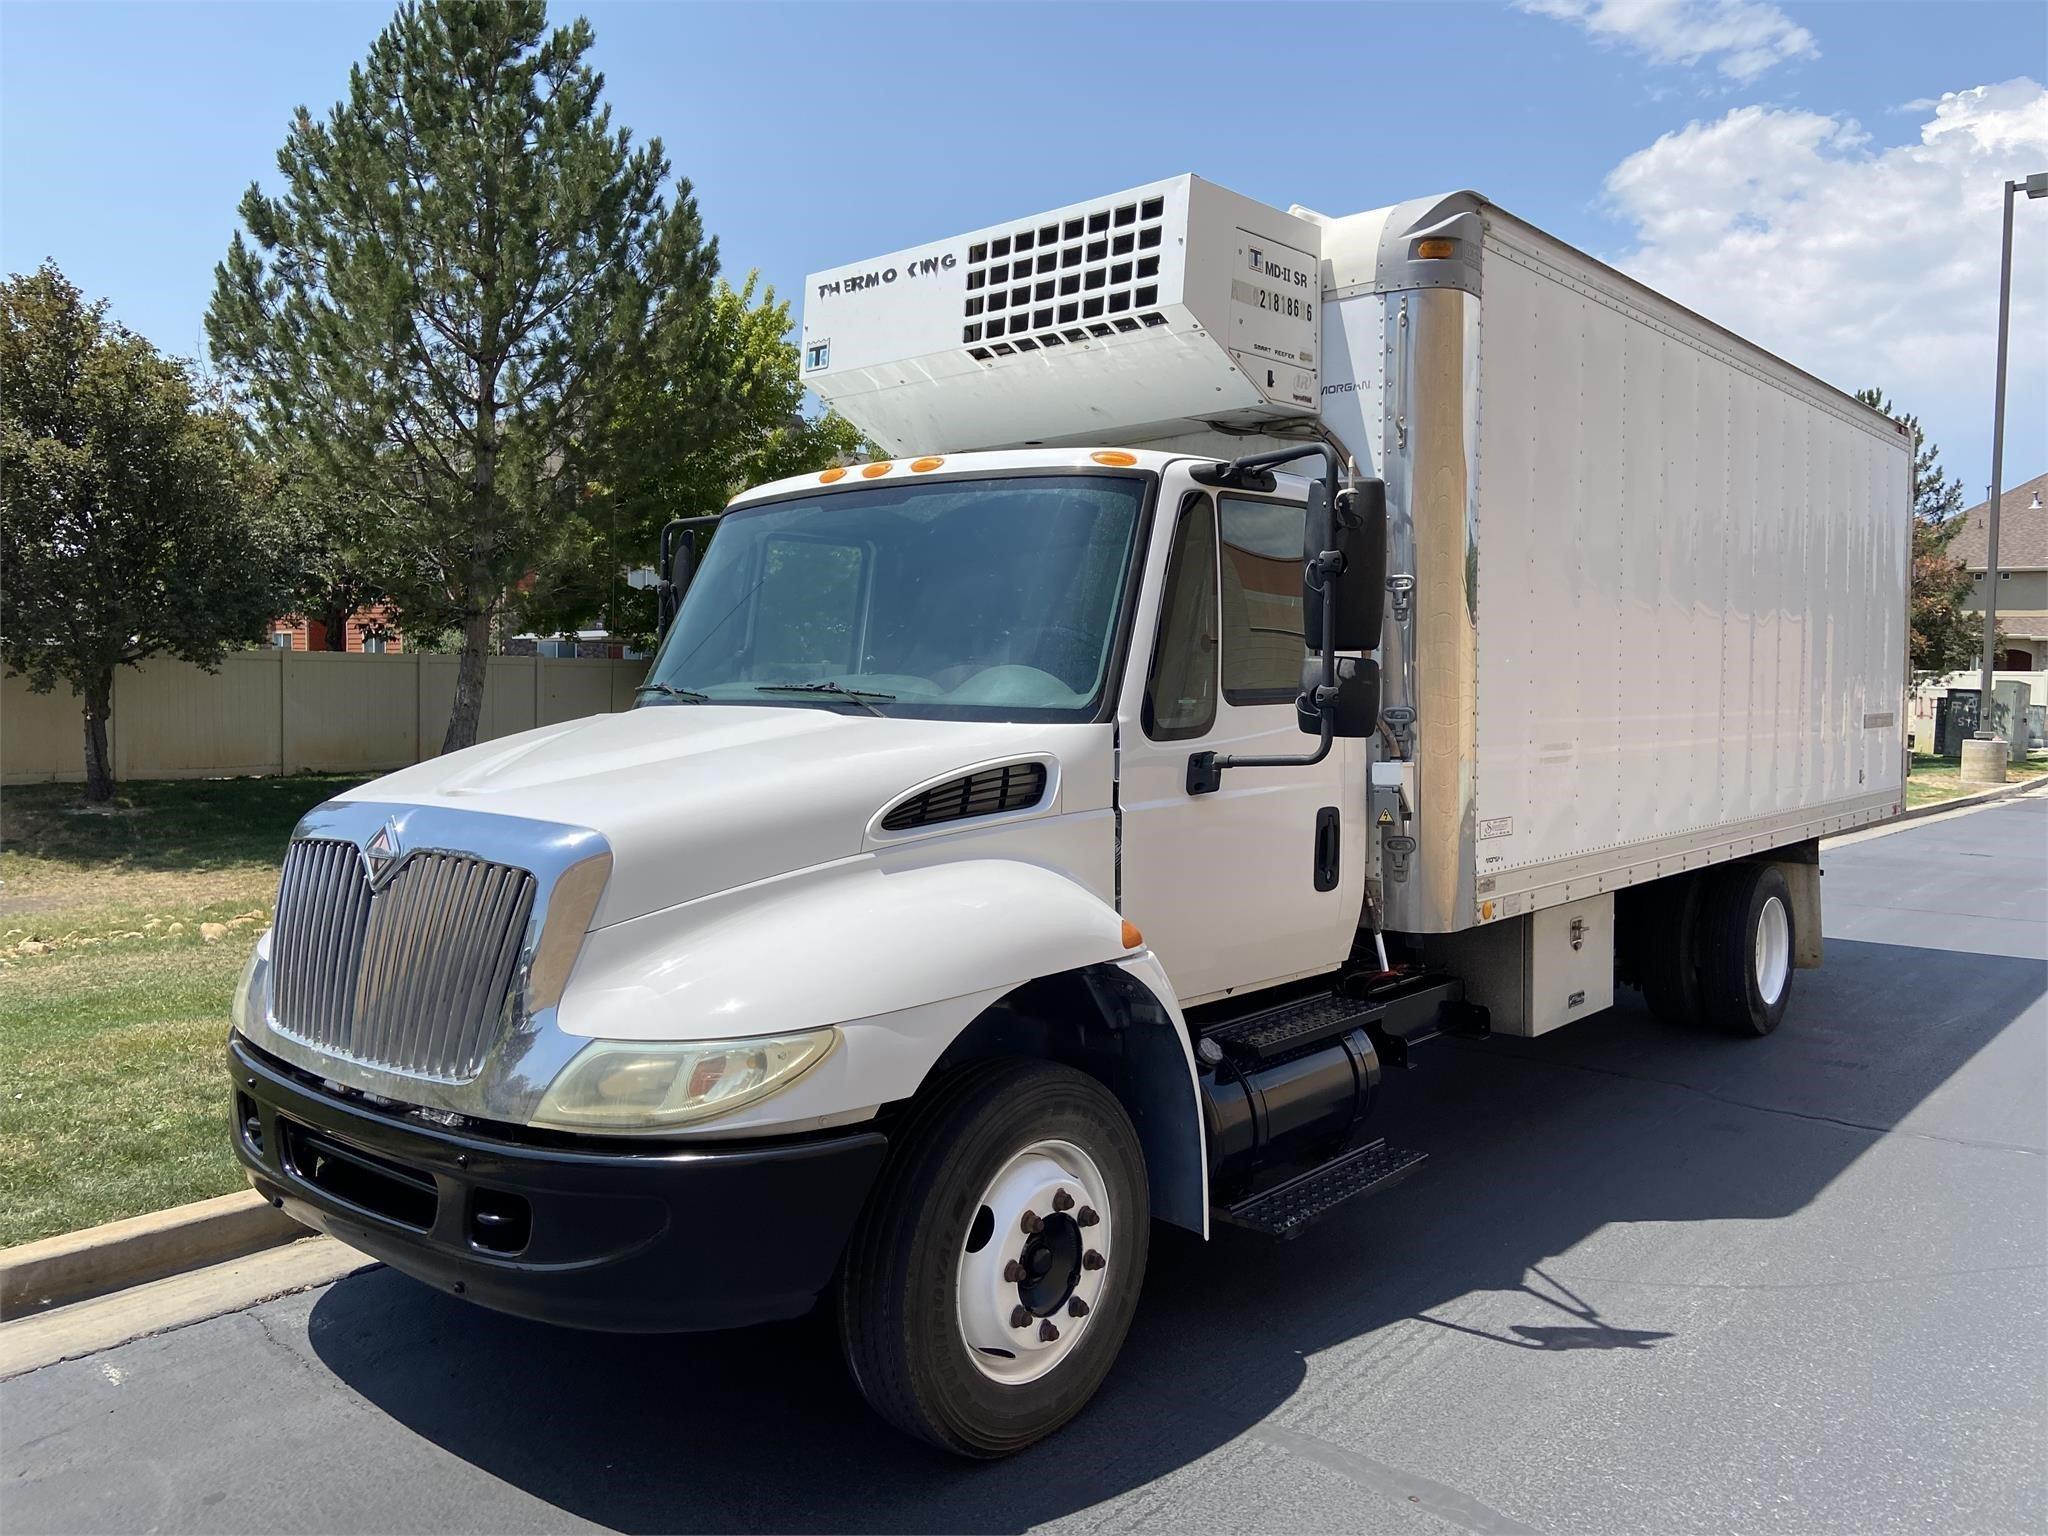 Used, 2003, INTERNATIONAL, 4000, Reefer/Refrigerated Truck